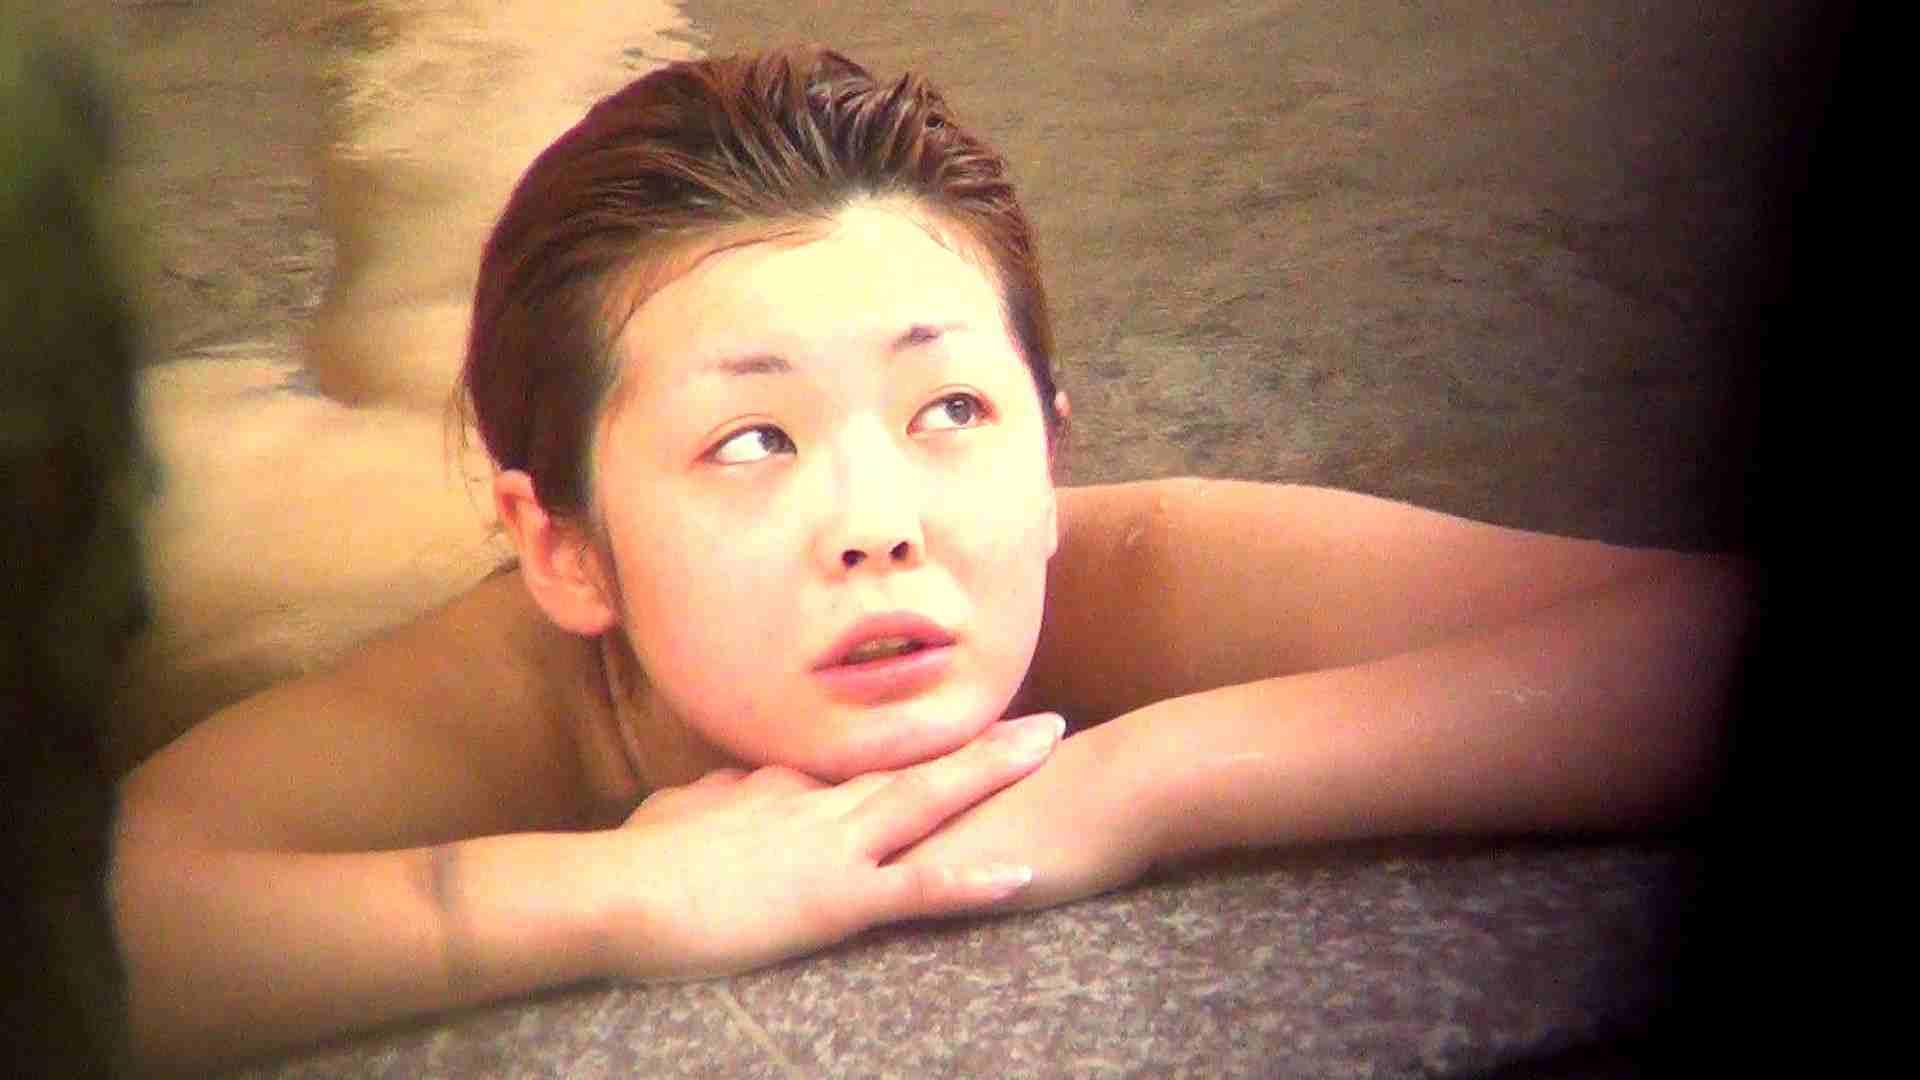 Aquaな露天風呂Vol.288 露天  85連発 71